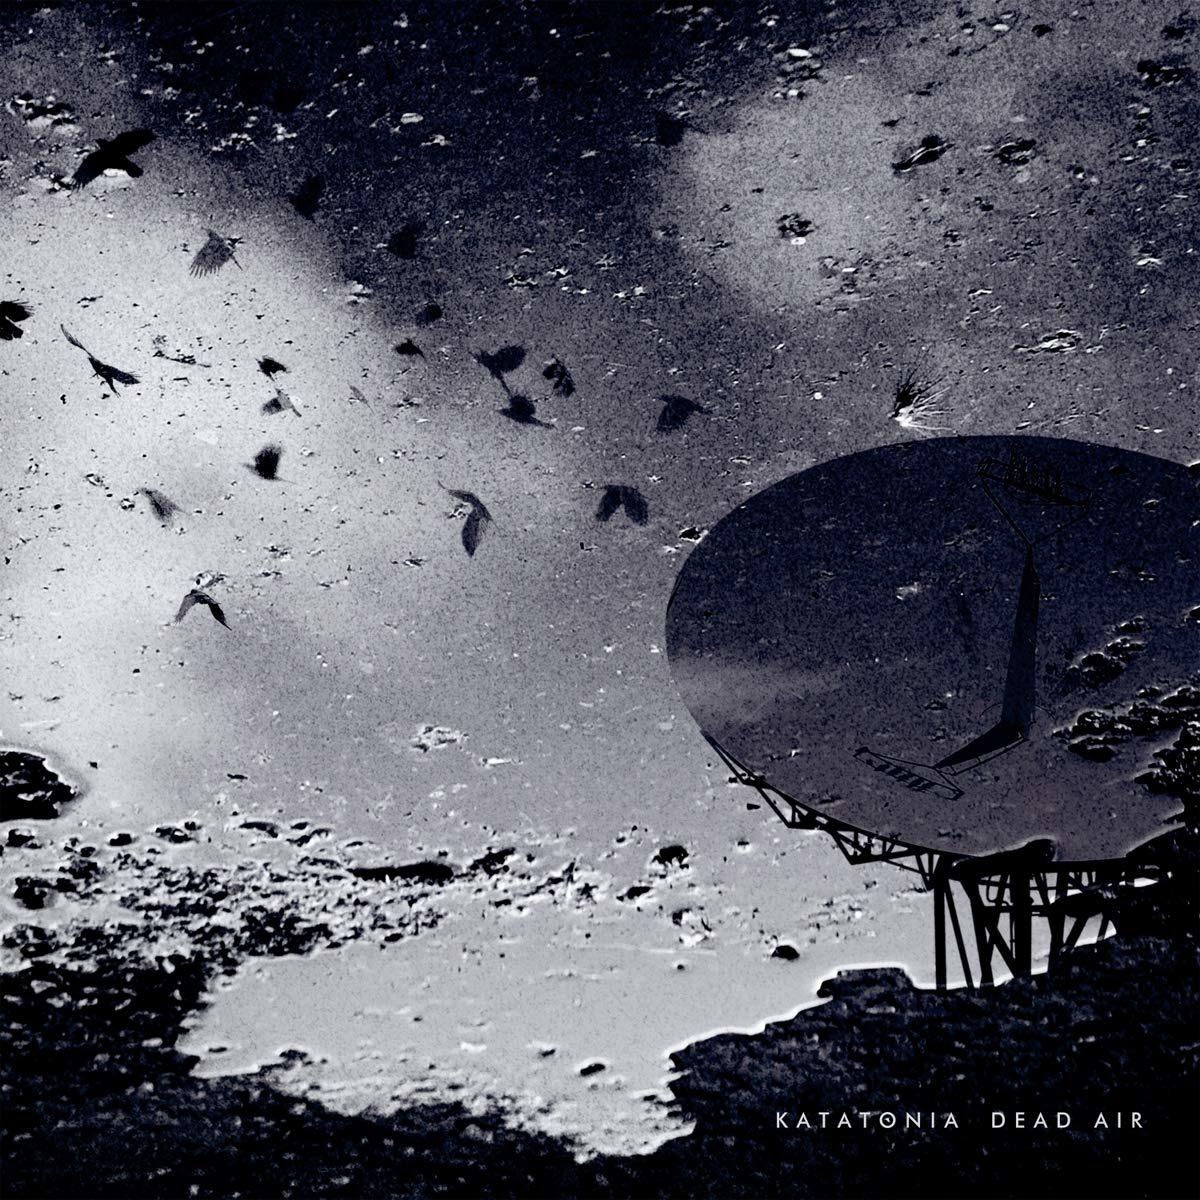 Dead Air - Katatonia - Film - PEACEVILLE - 0801056888570 - 4/12-2020